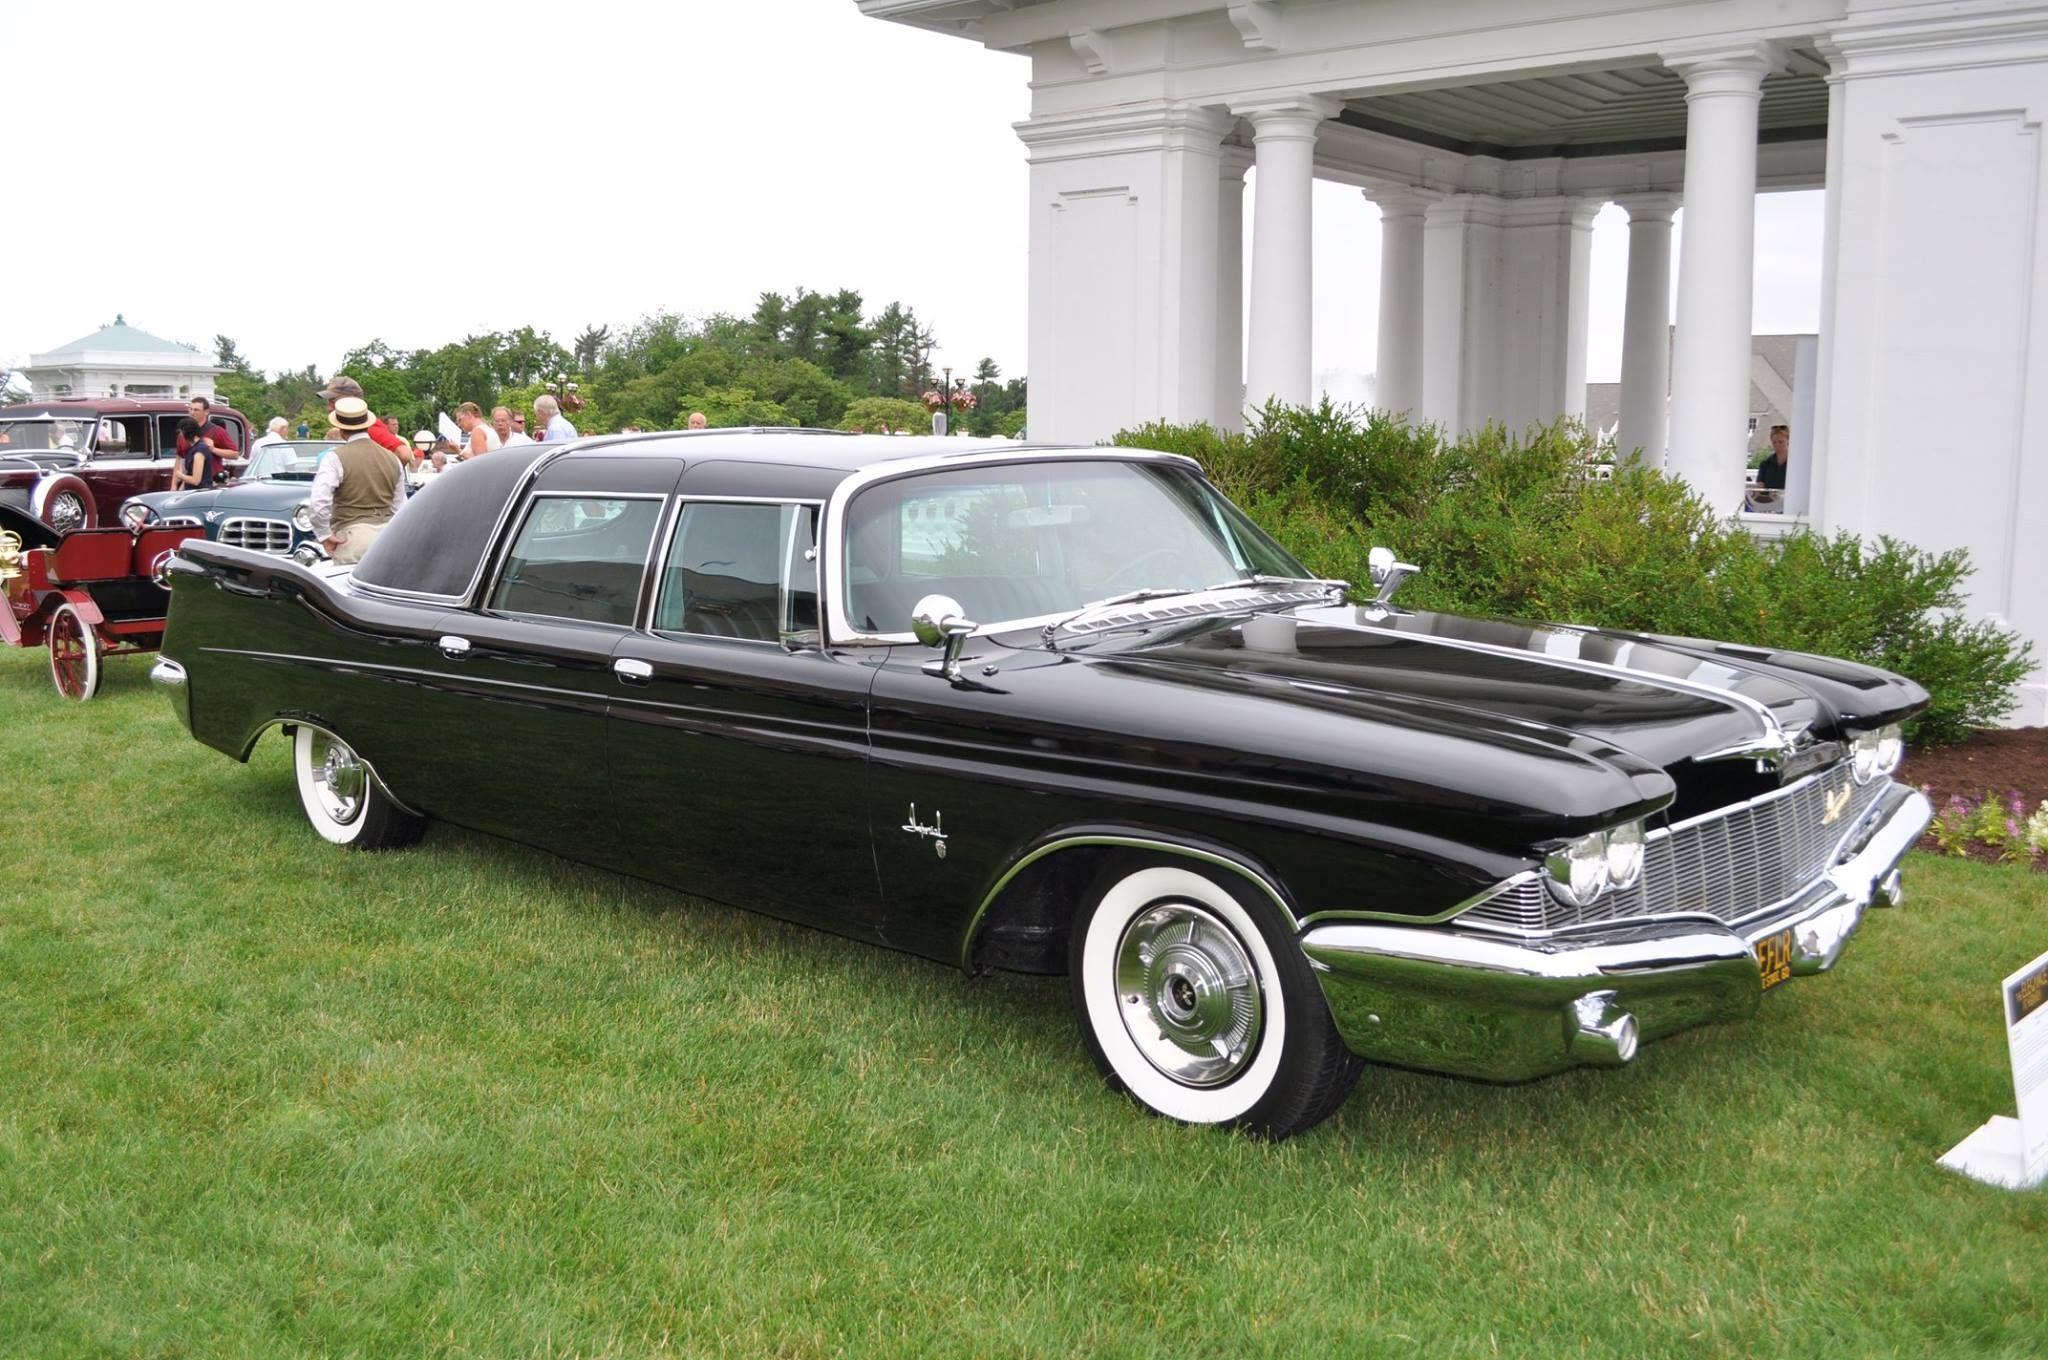 Nelson Rockefeller S 1960 Imperial Crown Limousine Ghia